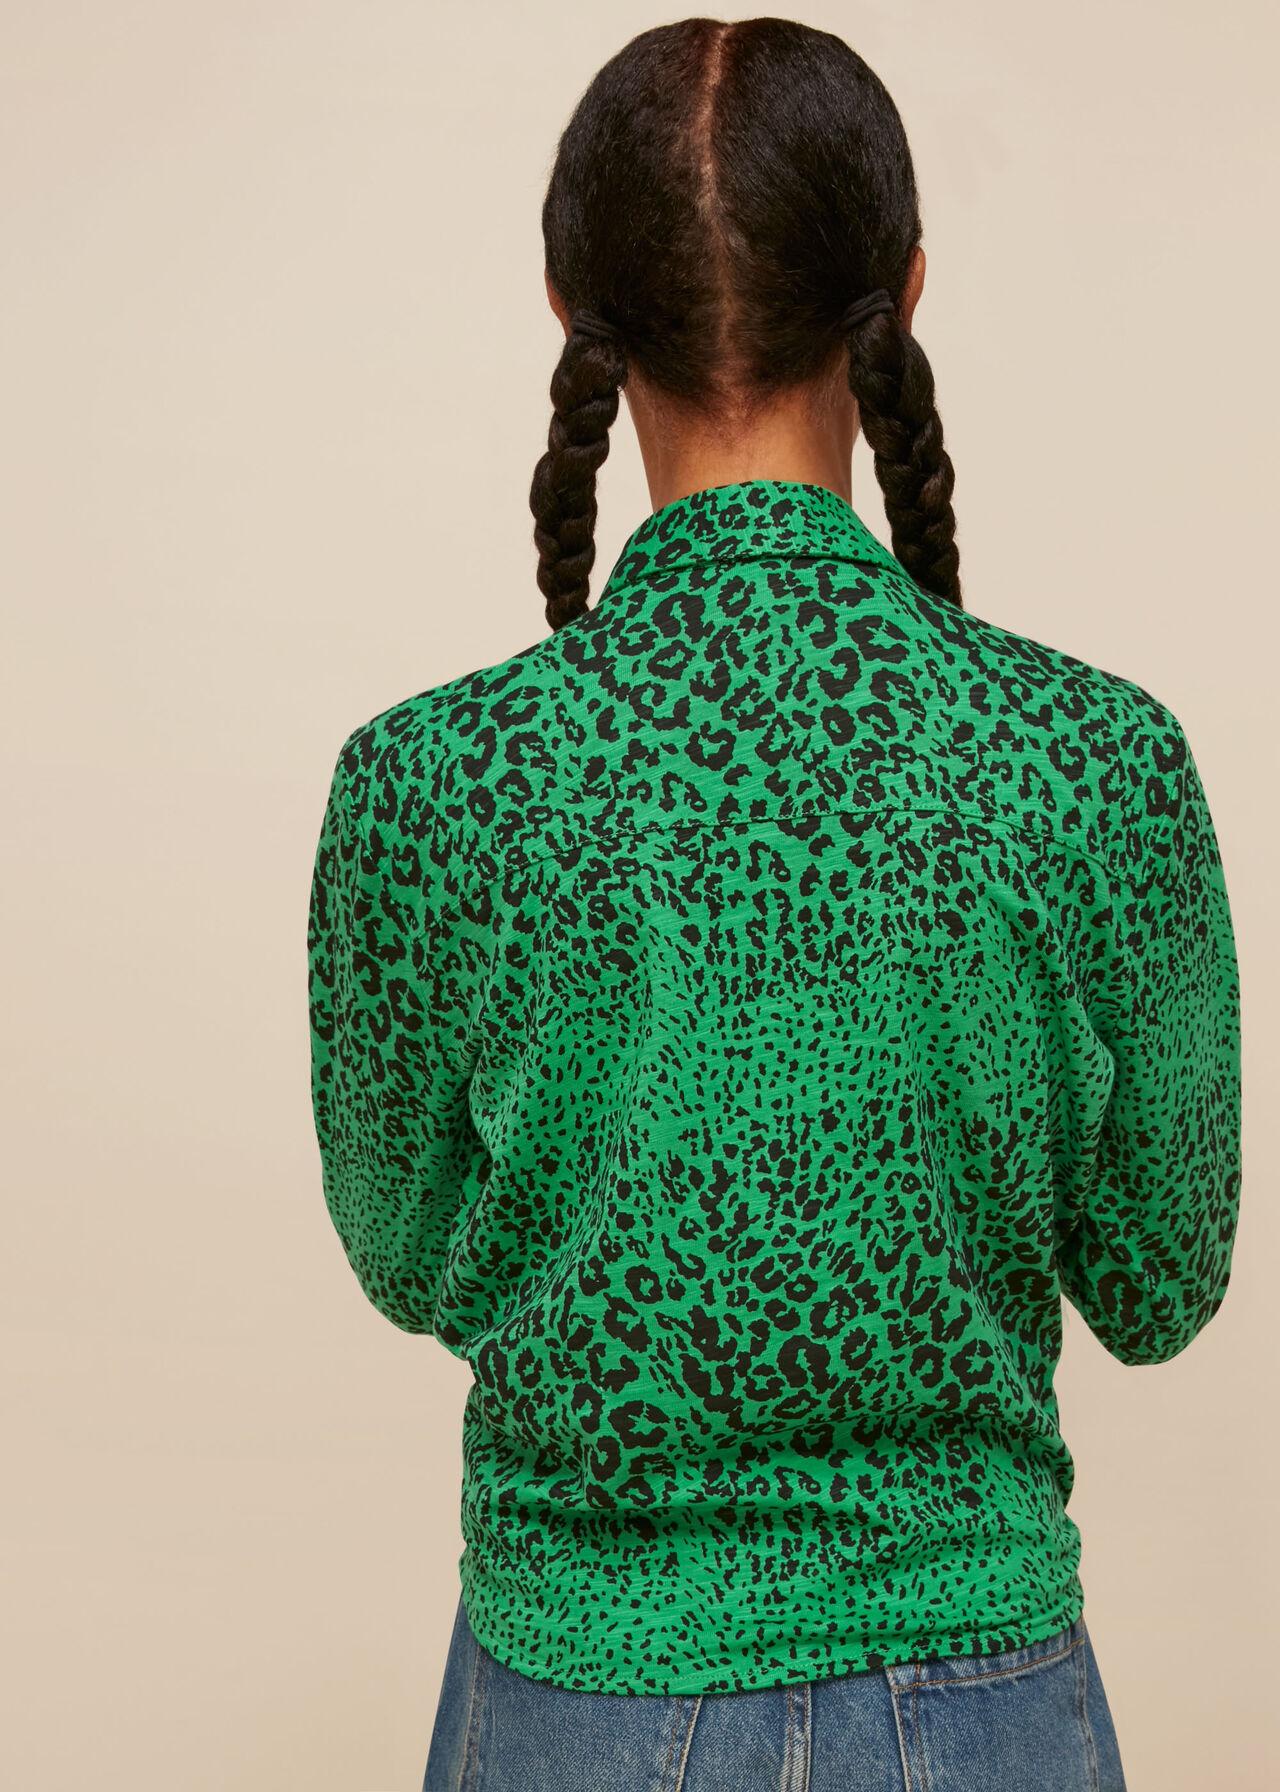 Speckled Animal Tie Shirt